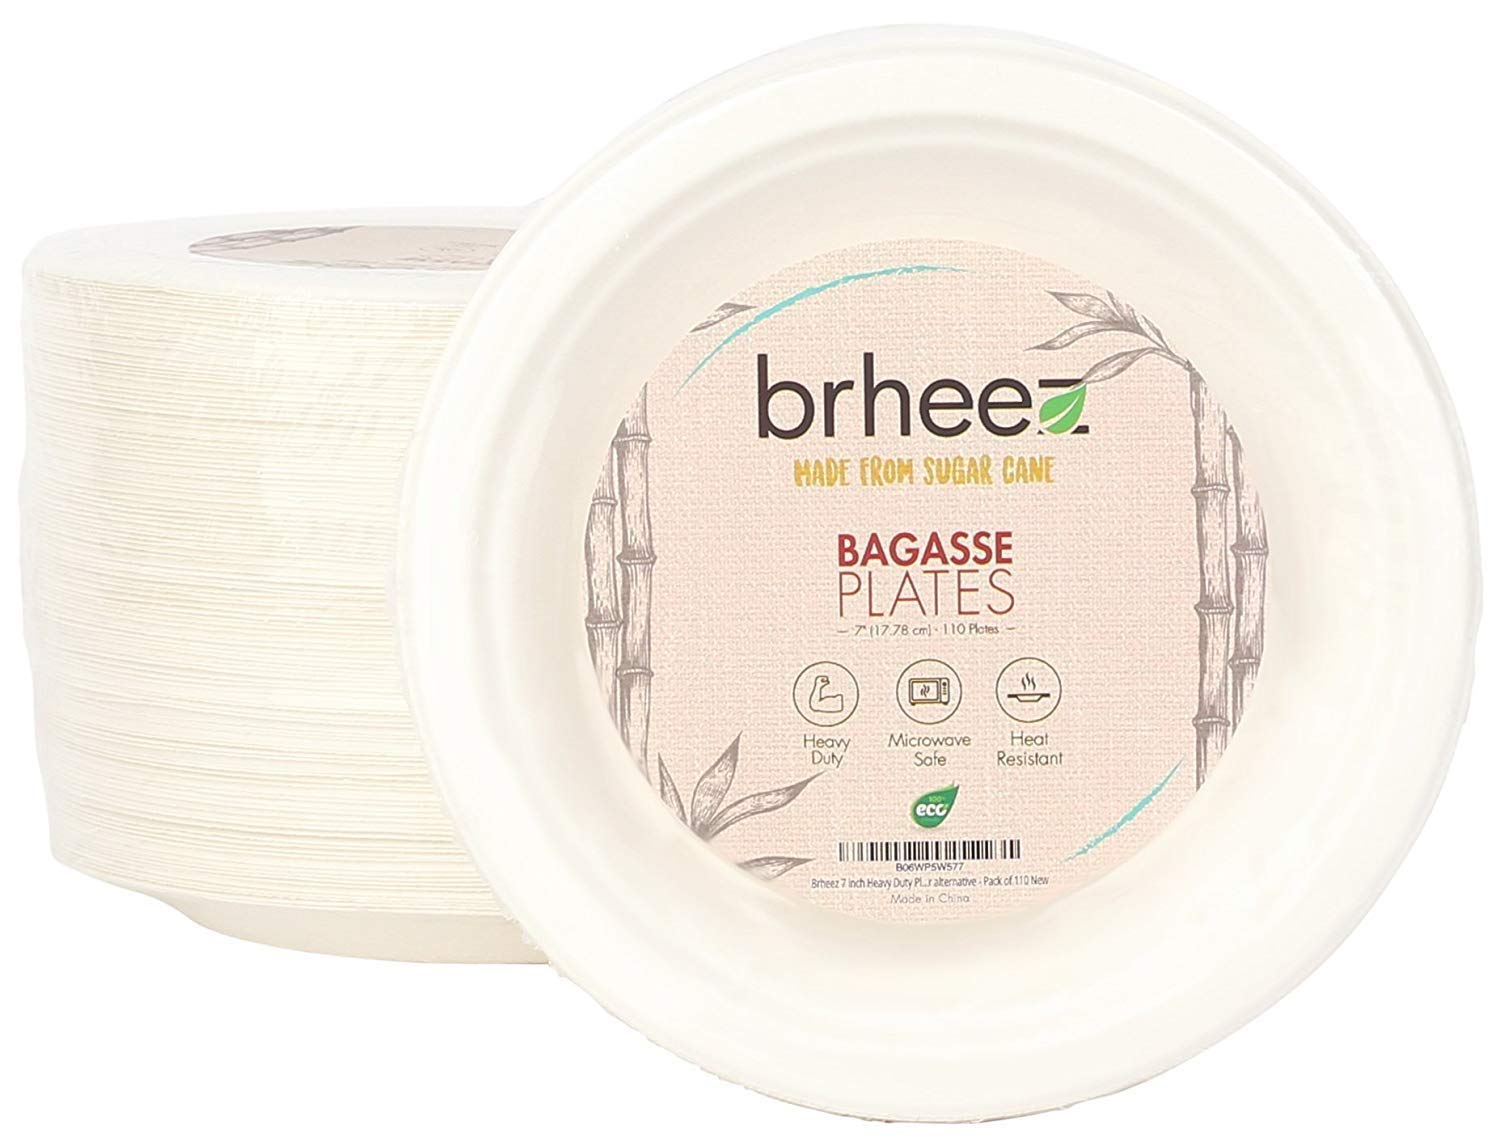 Brheez - Platos redondos desechables biodegradables para caña de ...